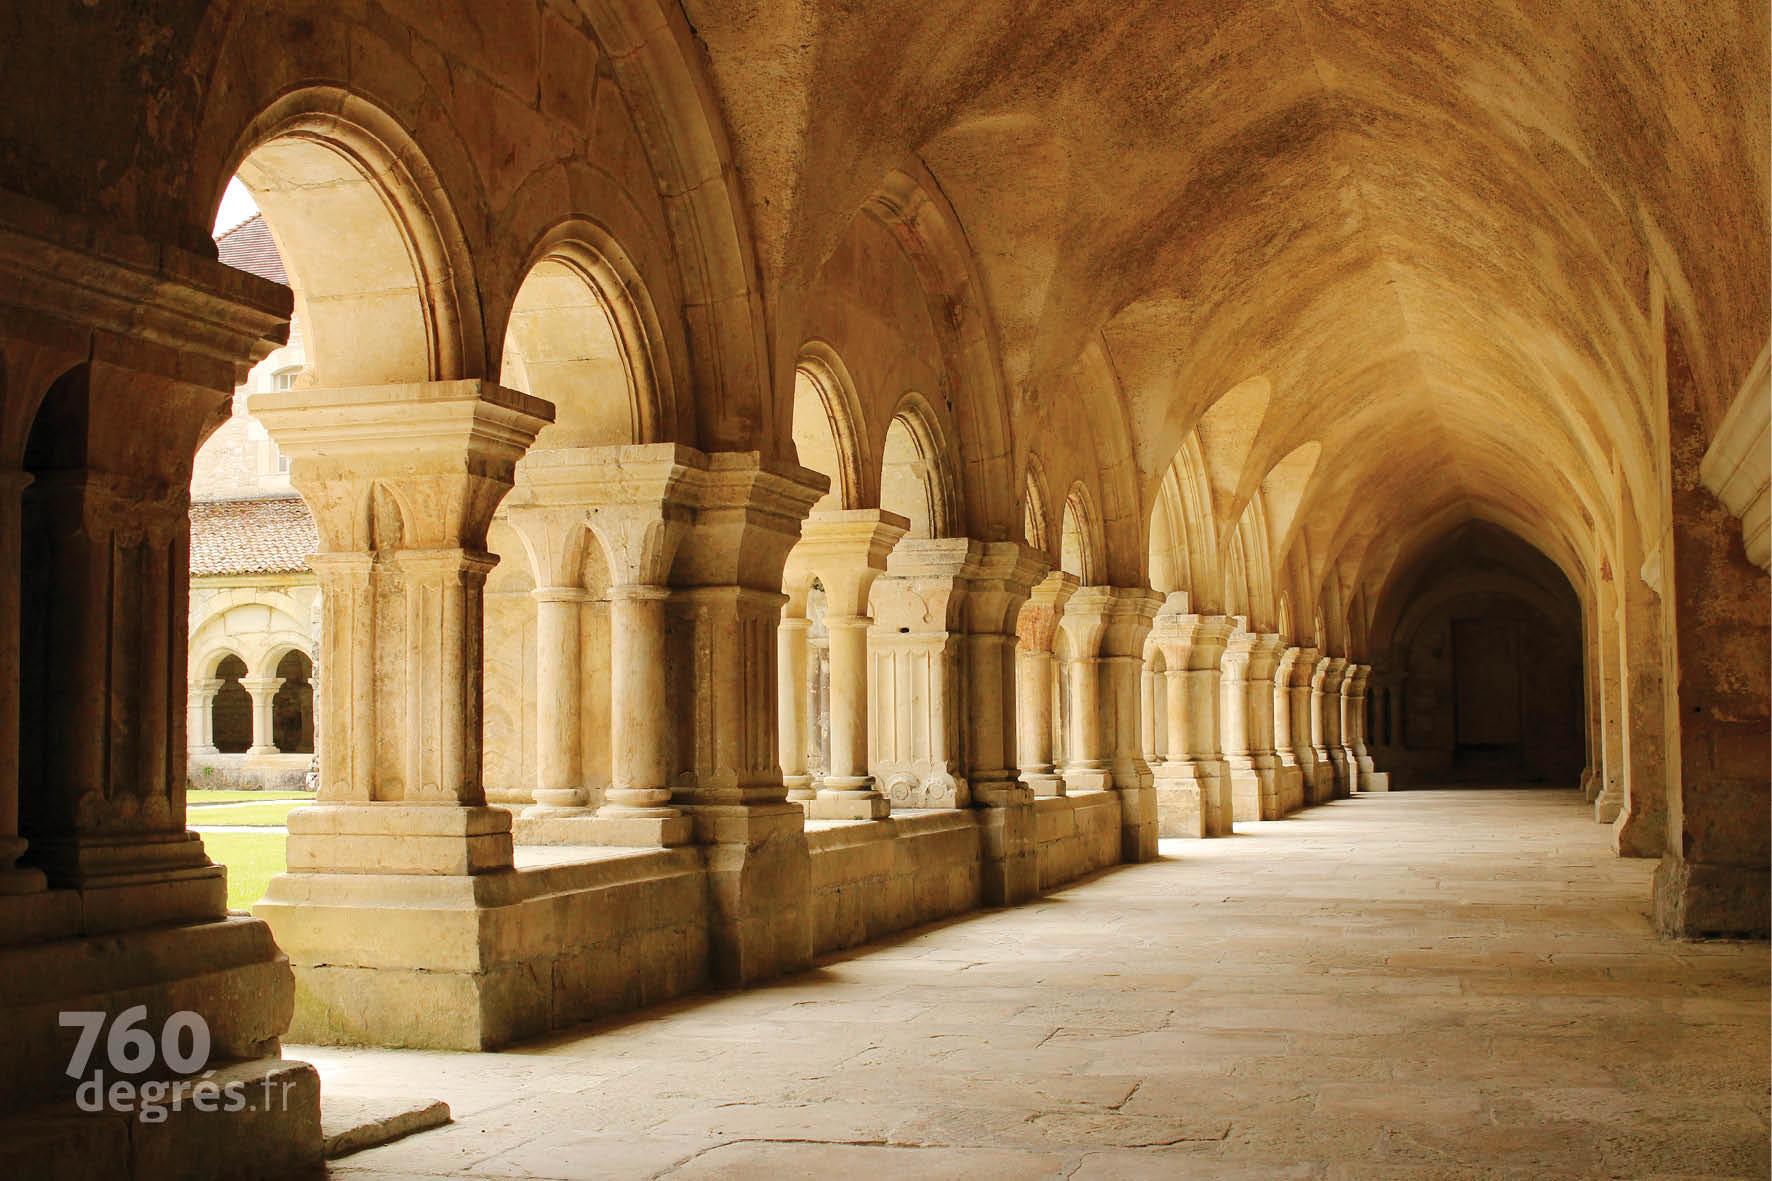 760degres-abbaye-fontenay-07